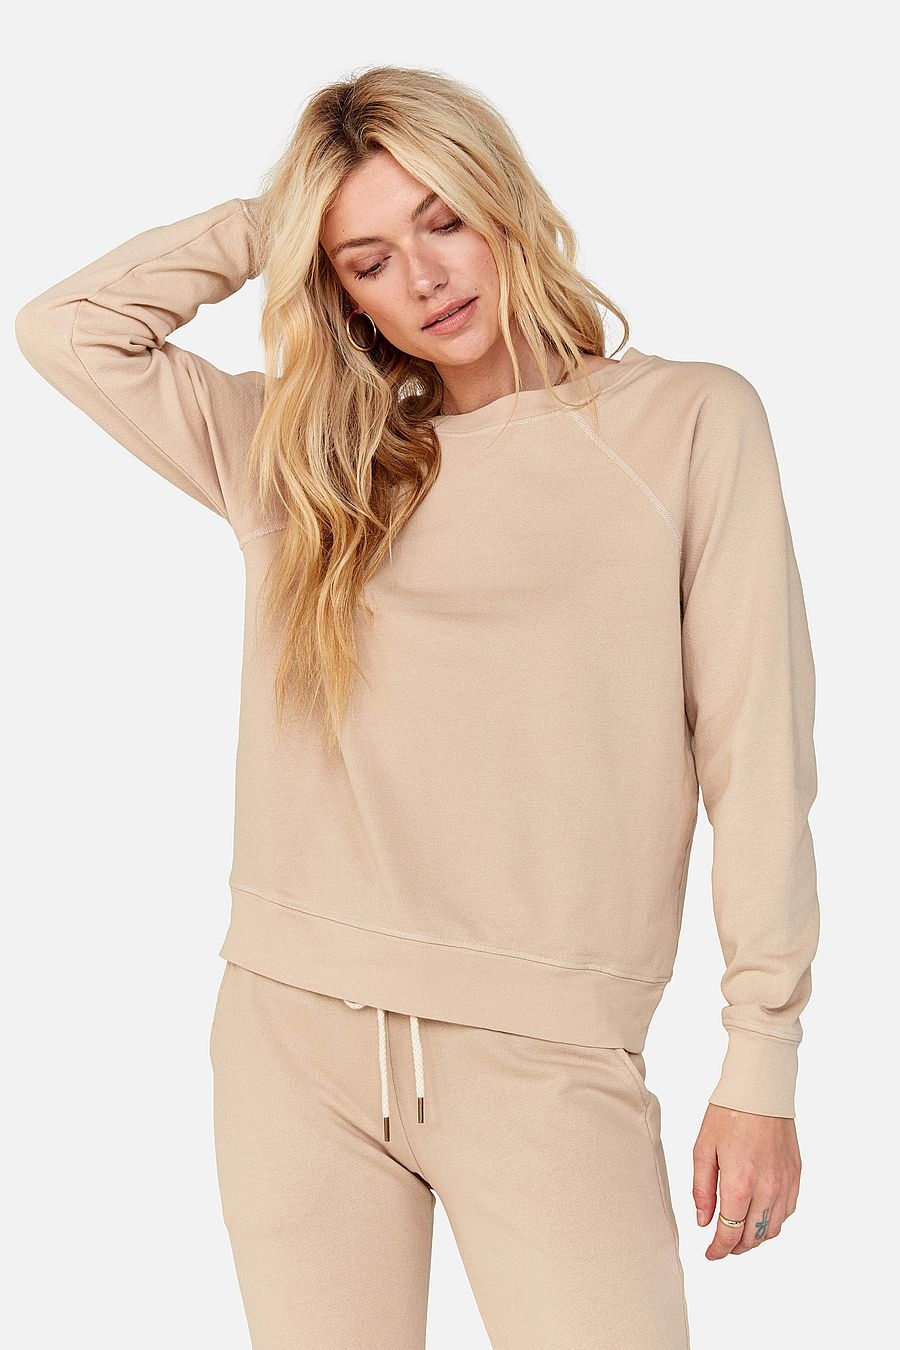 MATE The Label Organic Terry Raglan Sweatshirt - LATTE